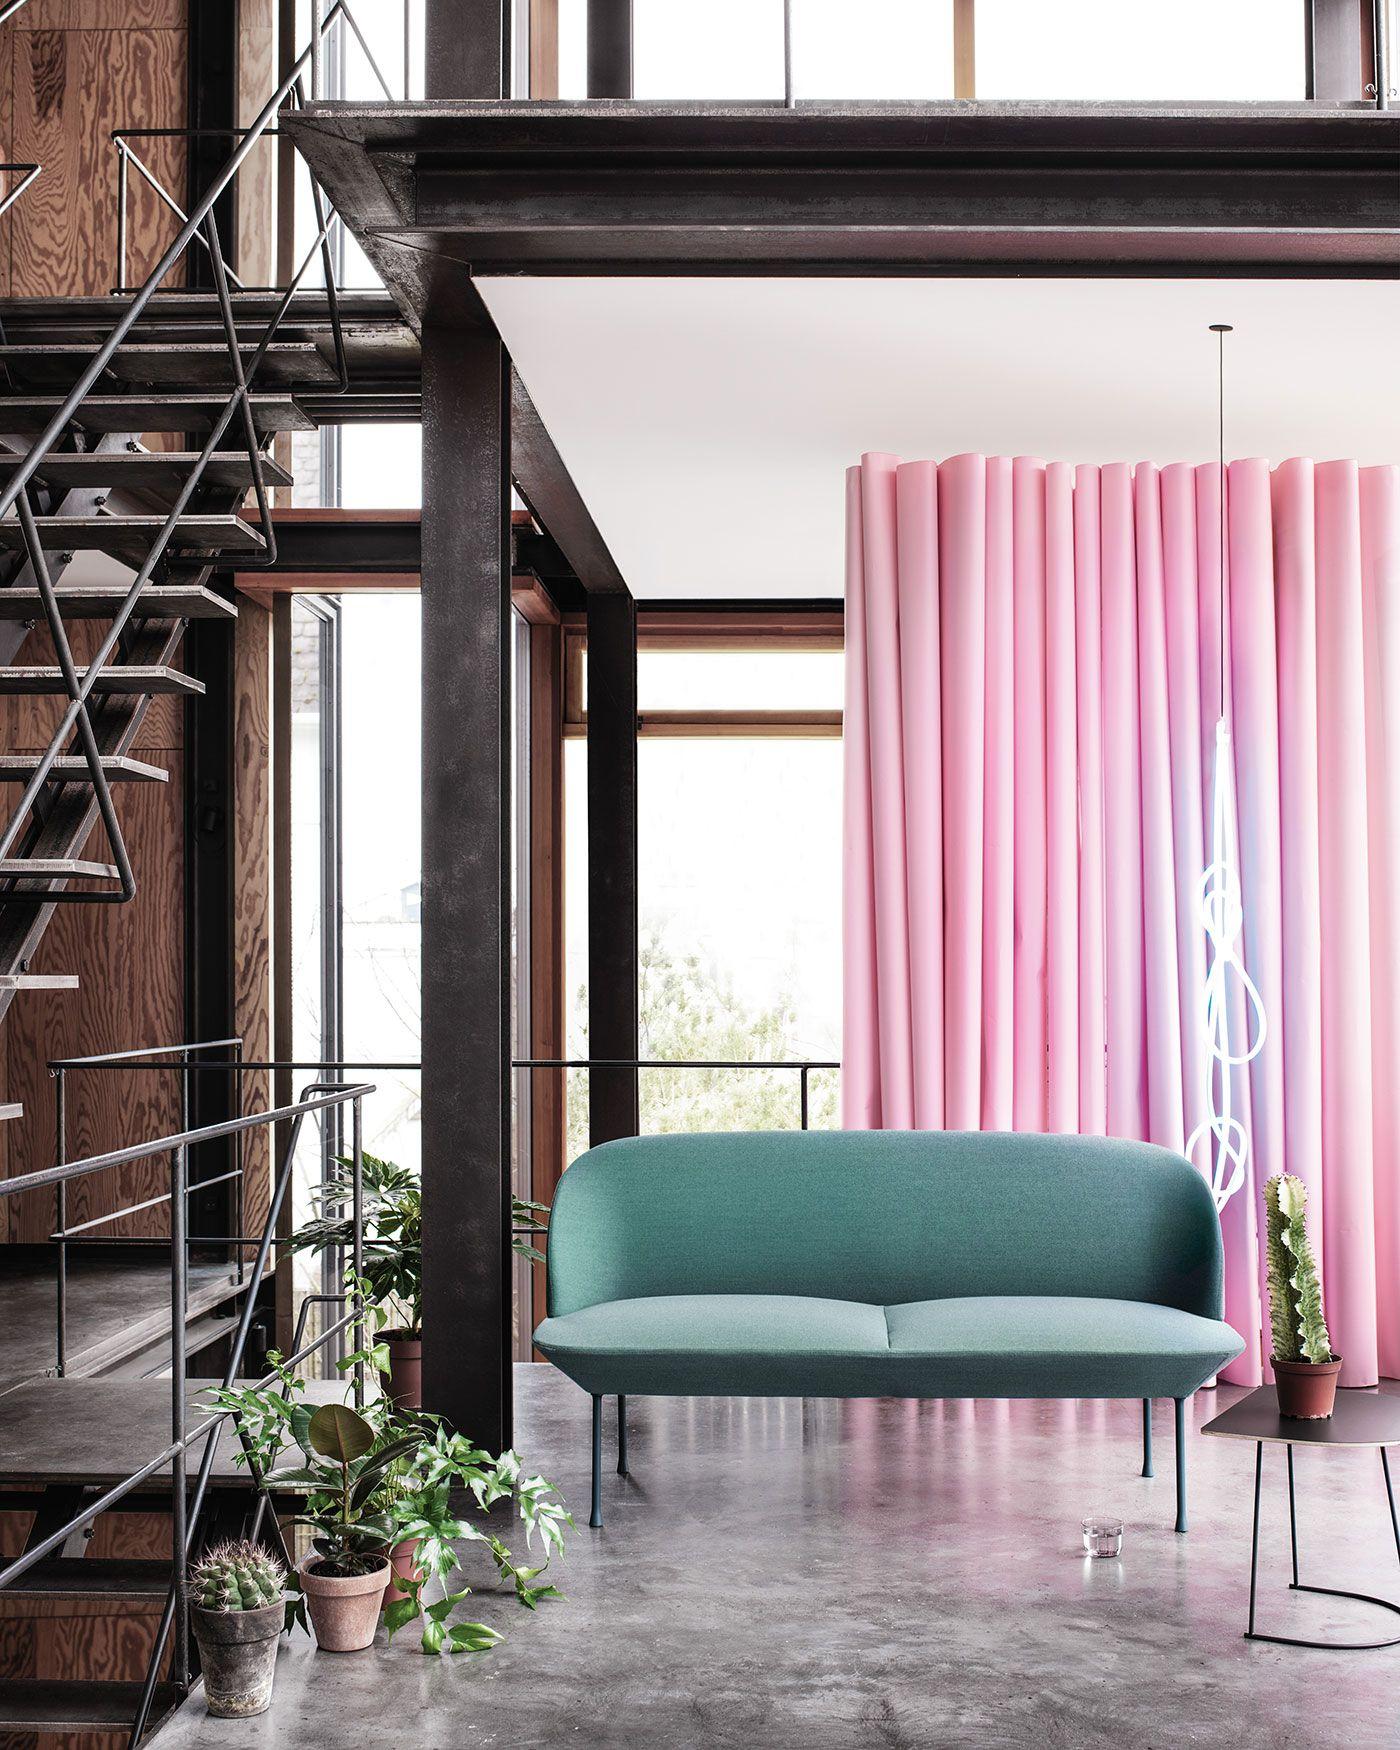 Scandinavian Modern Sofa Decor Inspiration From Muuto The Oslo Sofa Family Unites Geometric Lines With A Lig Med Billeder Ideer Boligindretning Boligindretning Mobeldesign